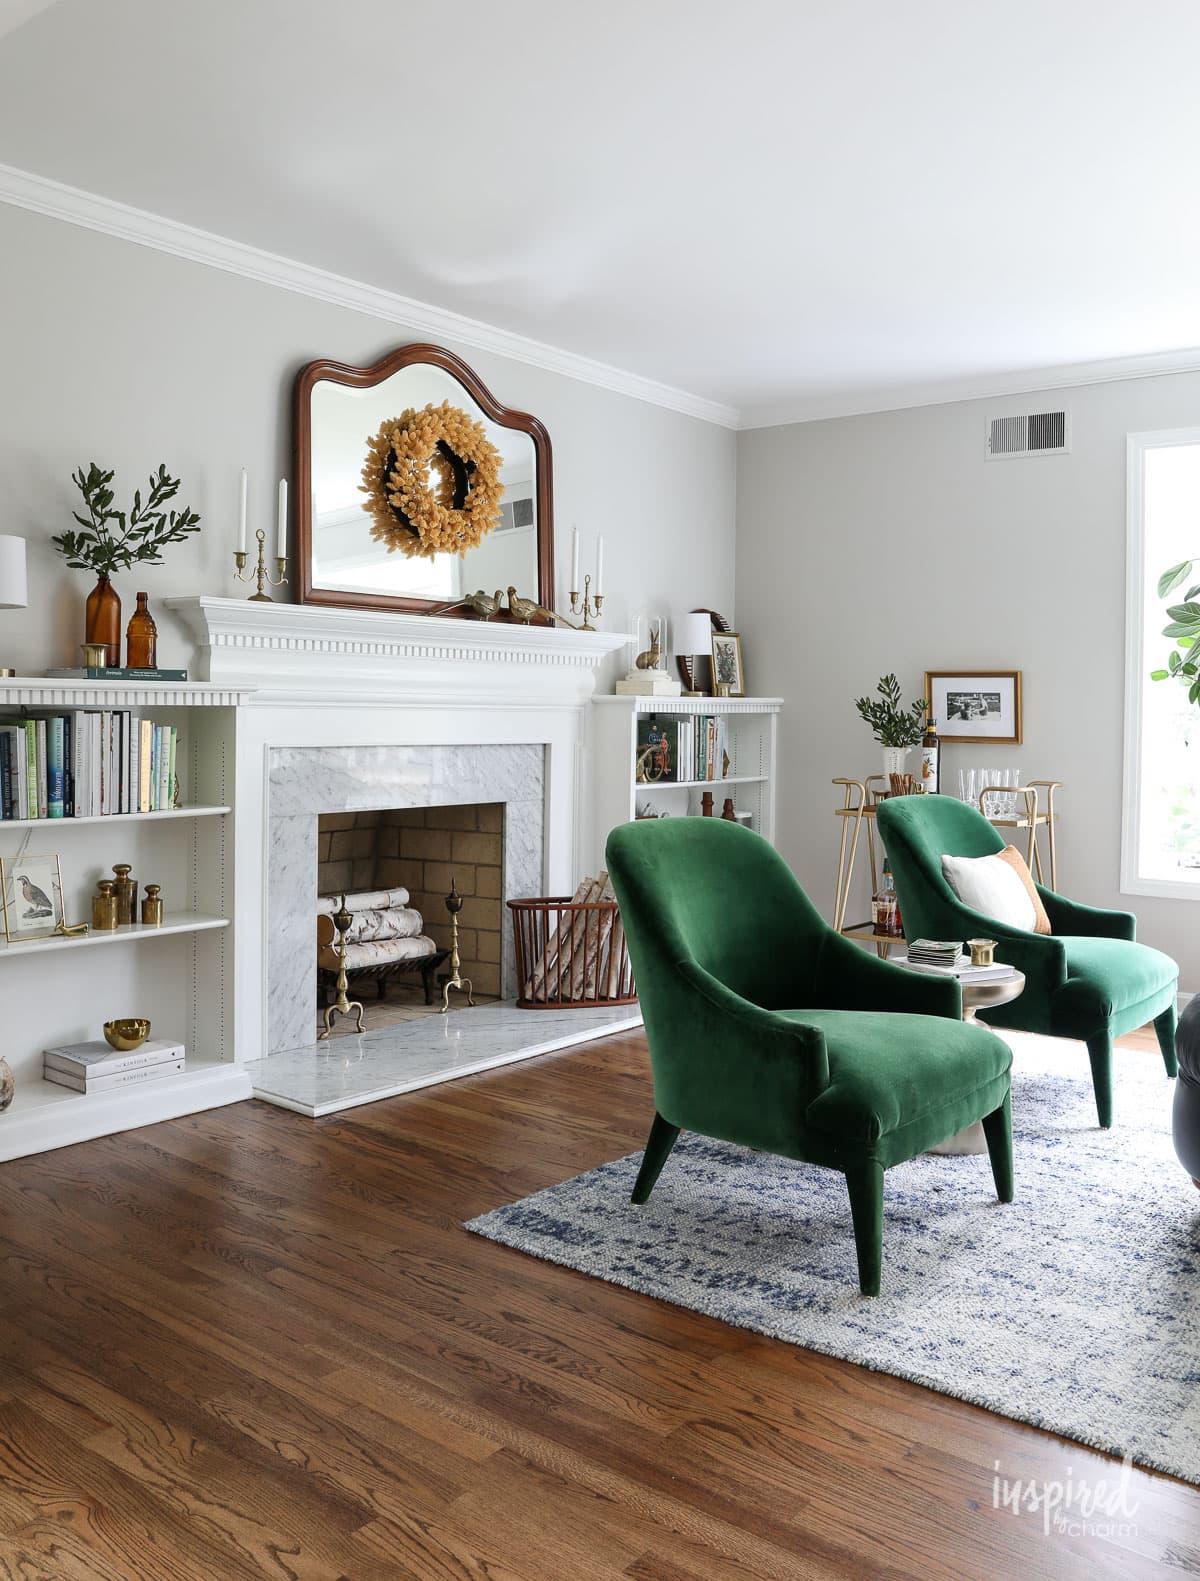 Living Room Autumn Decorations - Fall Decorating Ideas